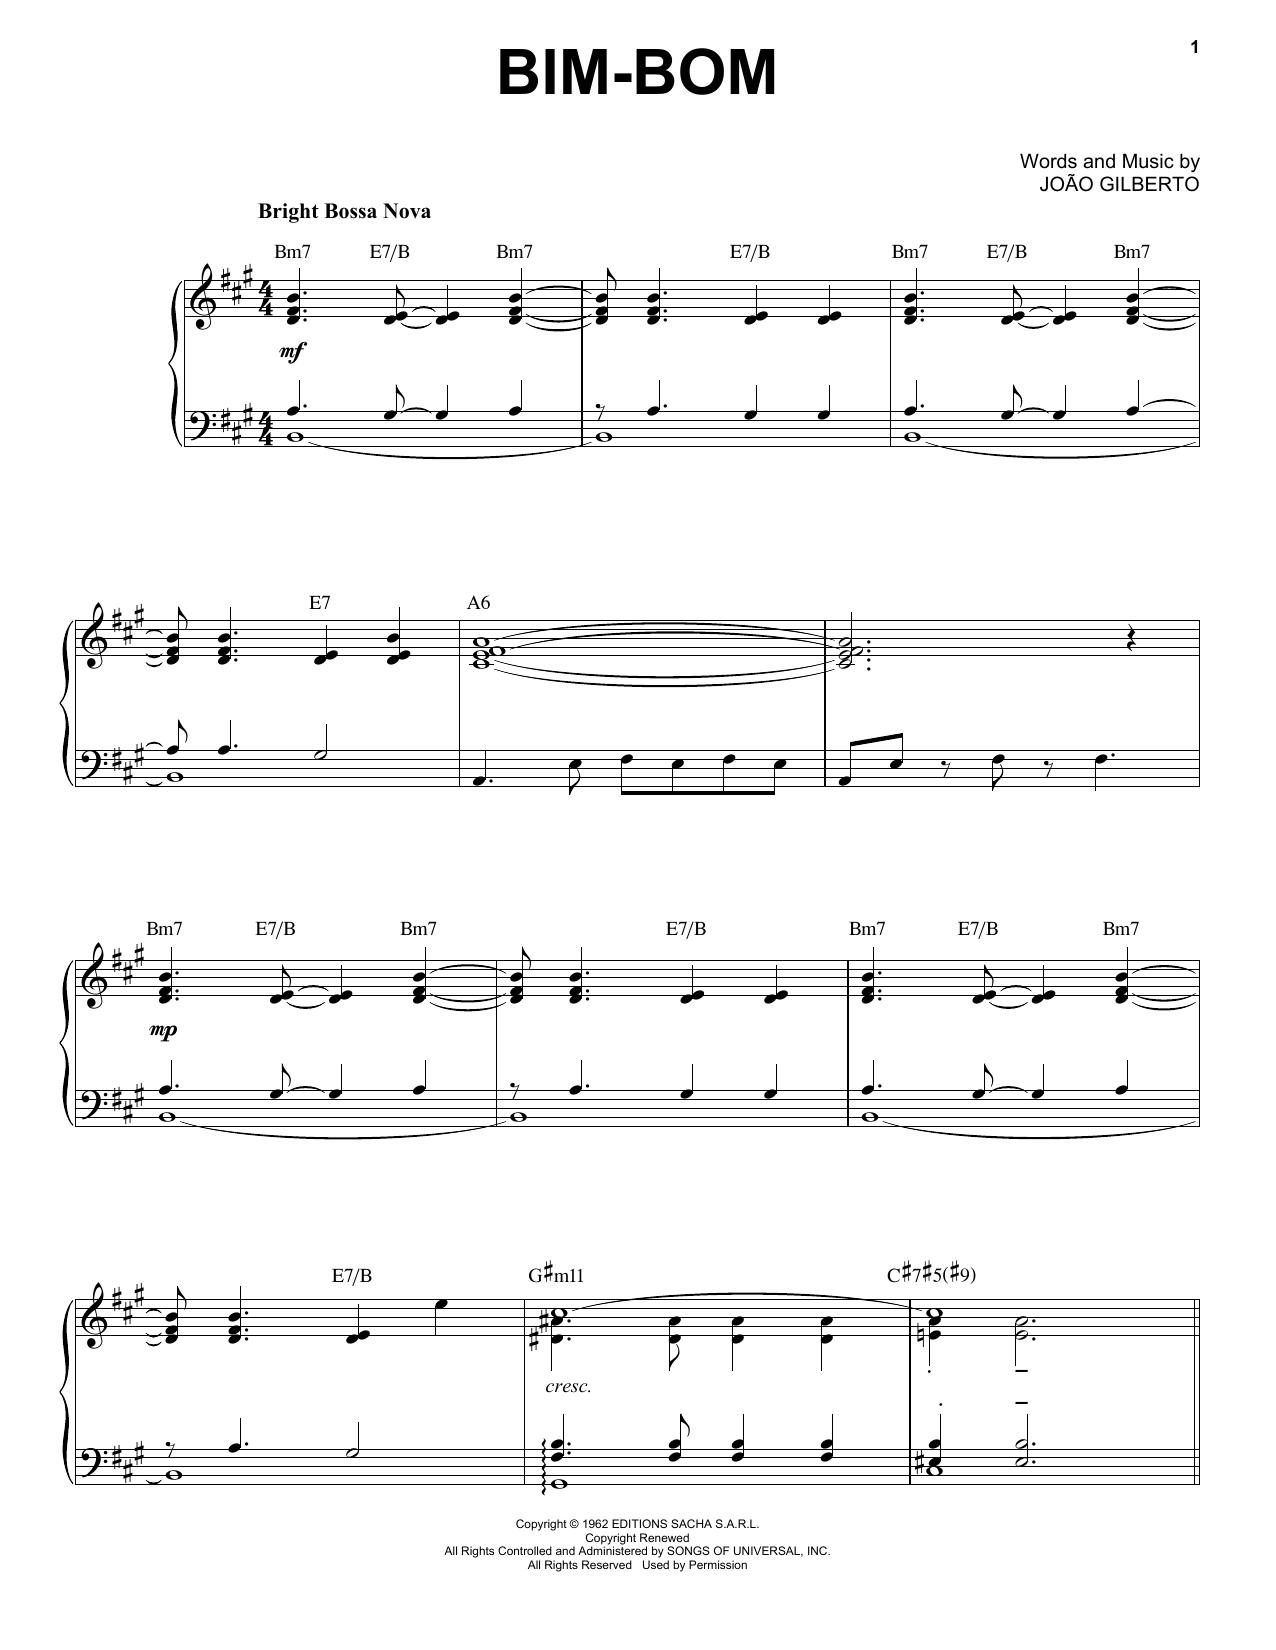 Joao Gilberto Bim-Bom [Jazz version] (arr. Brent Edstrom) sheet music notes and chords. Download Printable PDF.